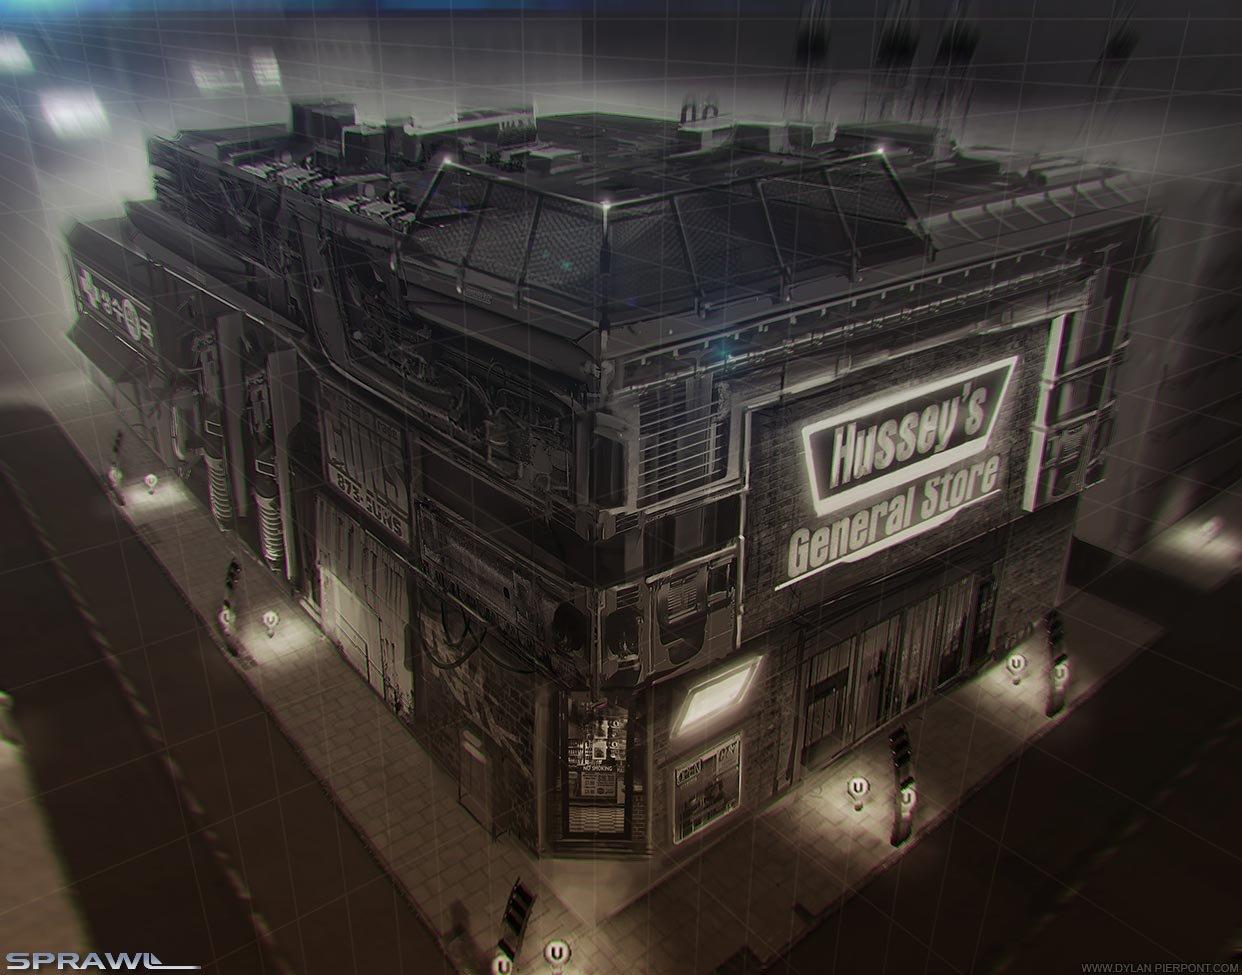 Dylan pierpont dylanpierpont sprawl newmarket building concept